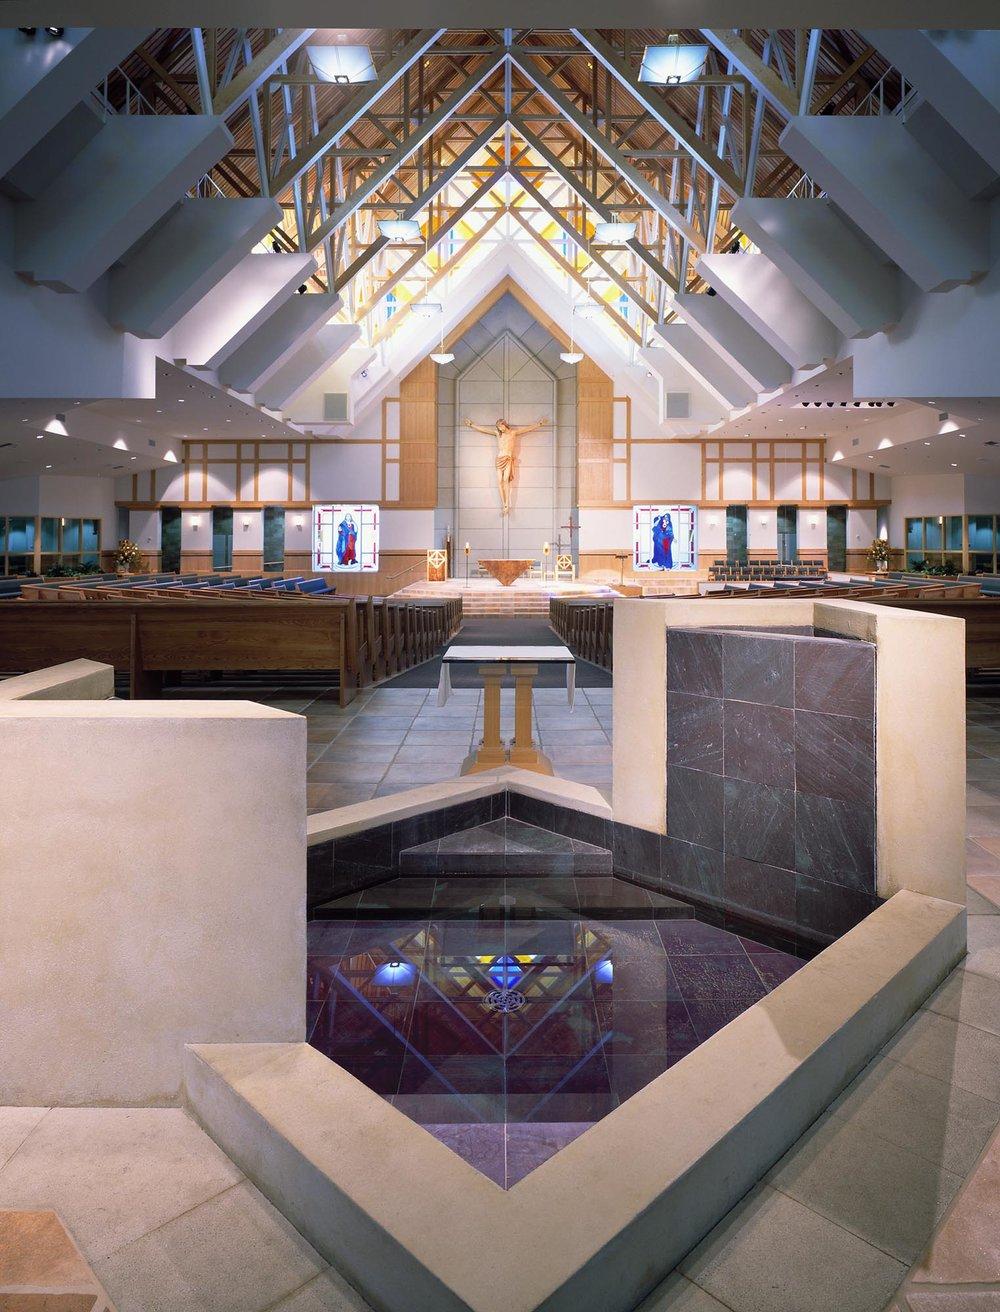 St-Paul-The-Apostle-Catholic-Church-02.jpg